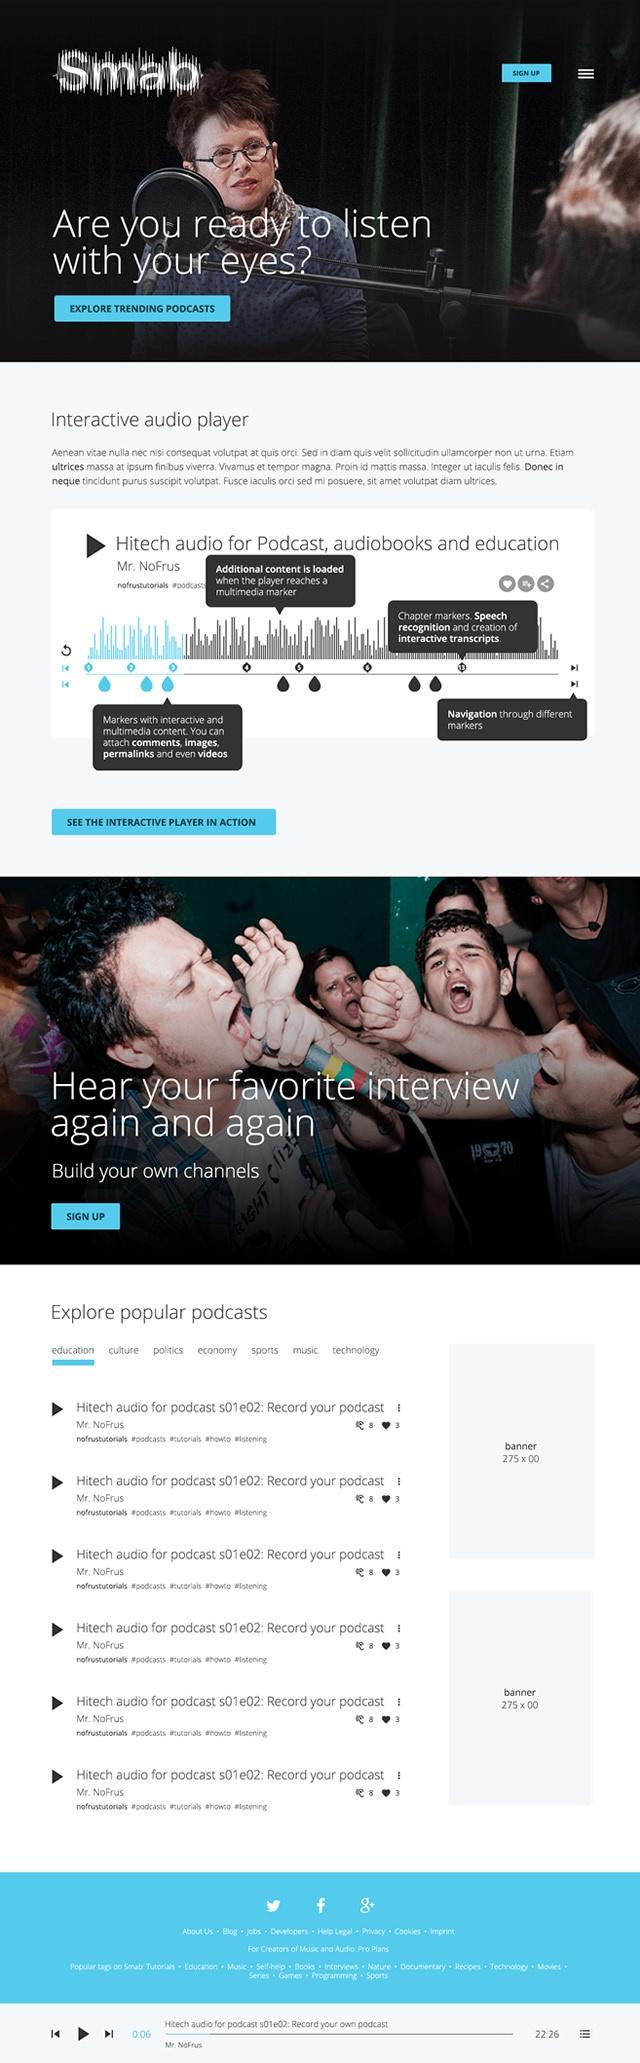 pagina inicial de smab podcaster audio tools